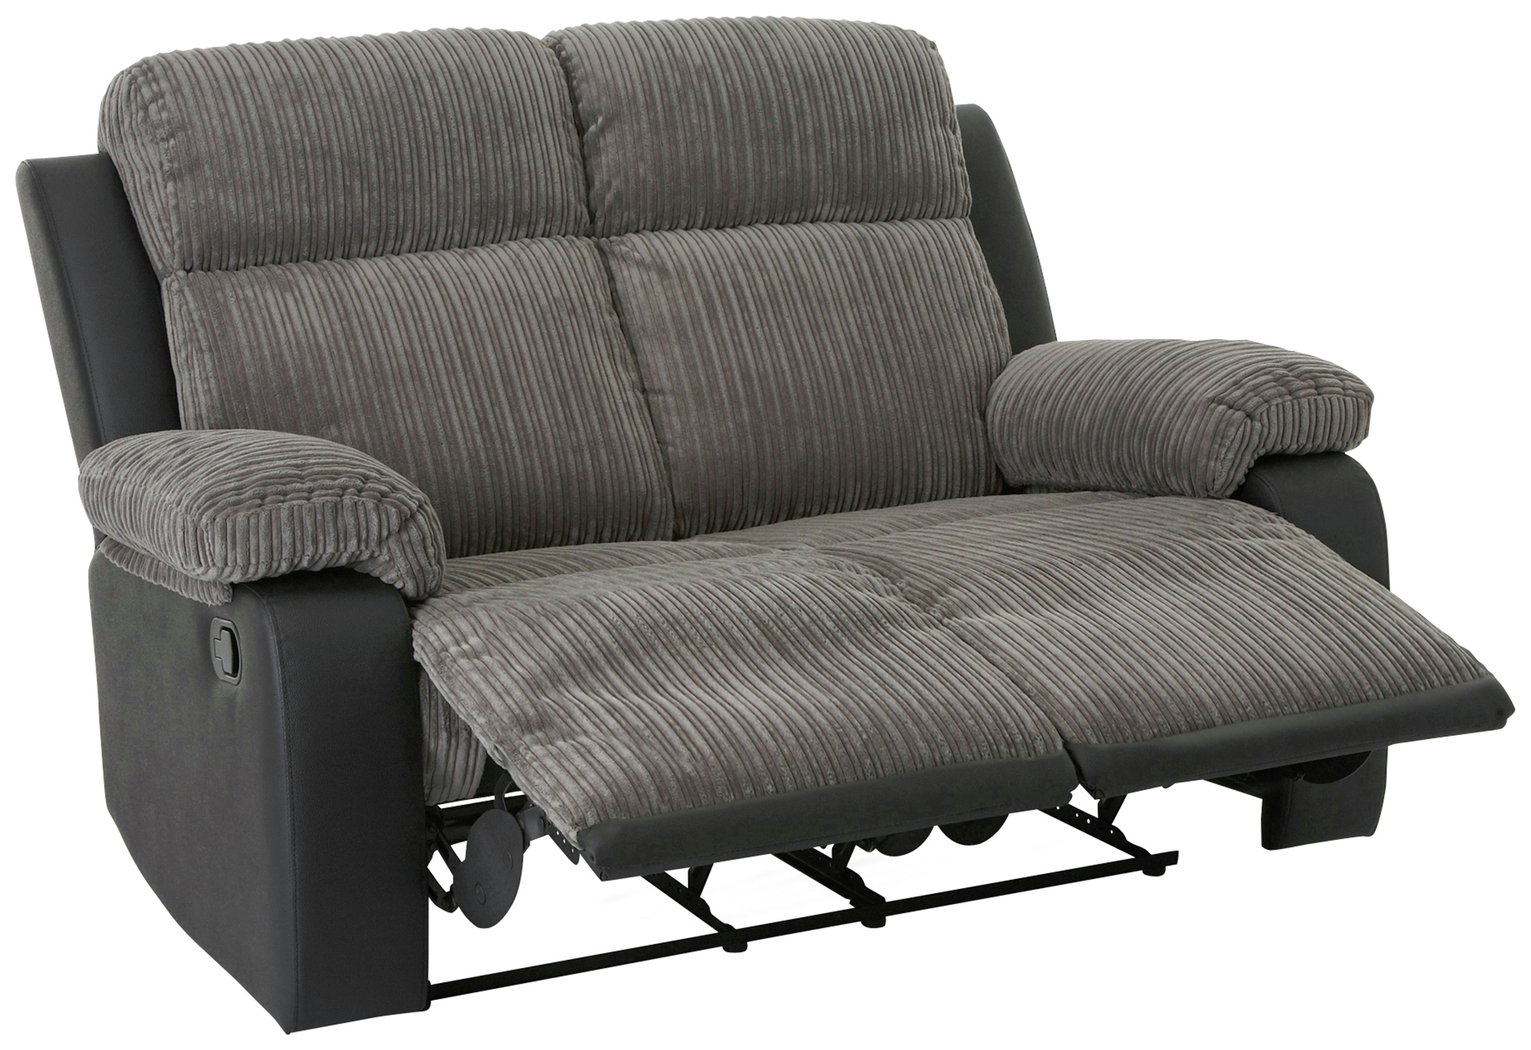 Argos Home Bradley 2 Seater Fabric Recliner Sofa - Charcoal